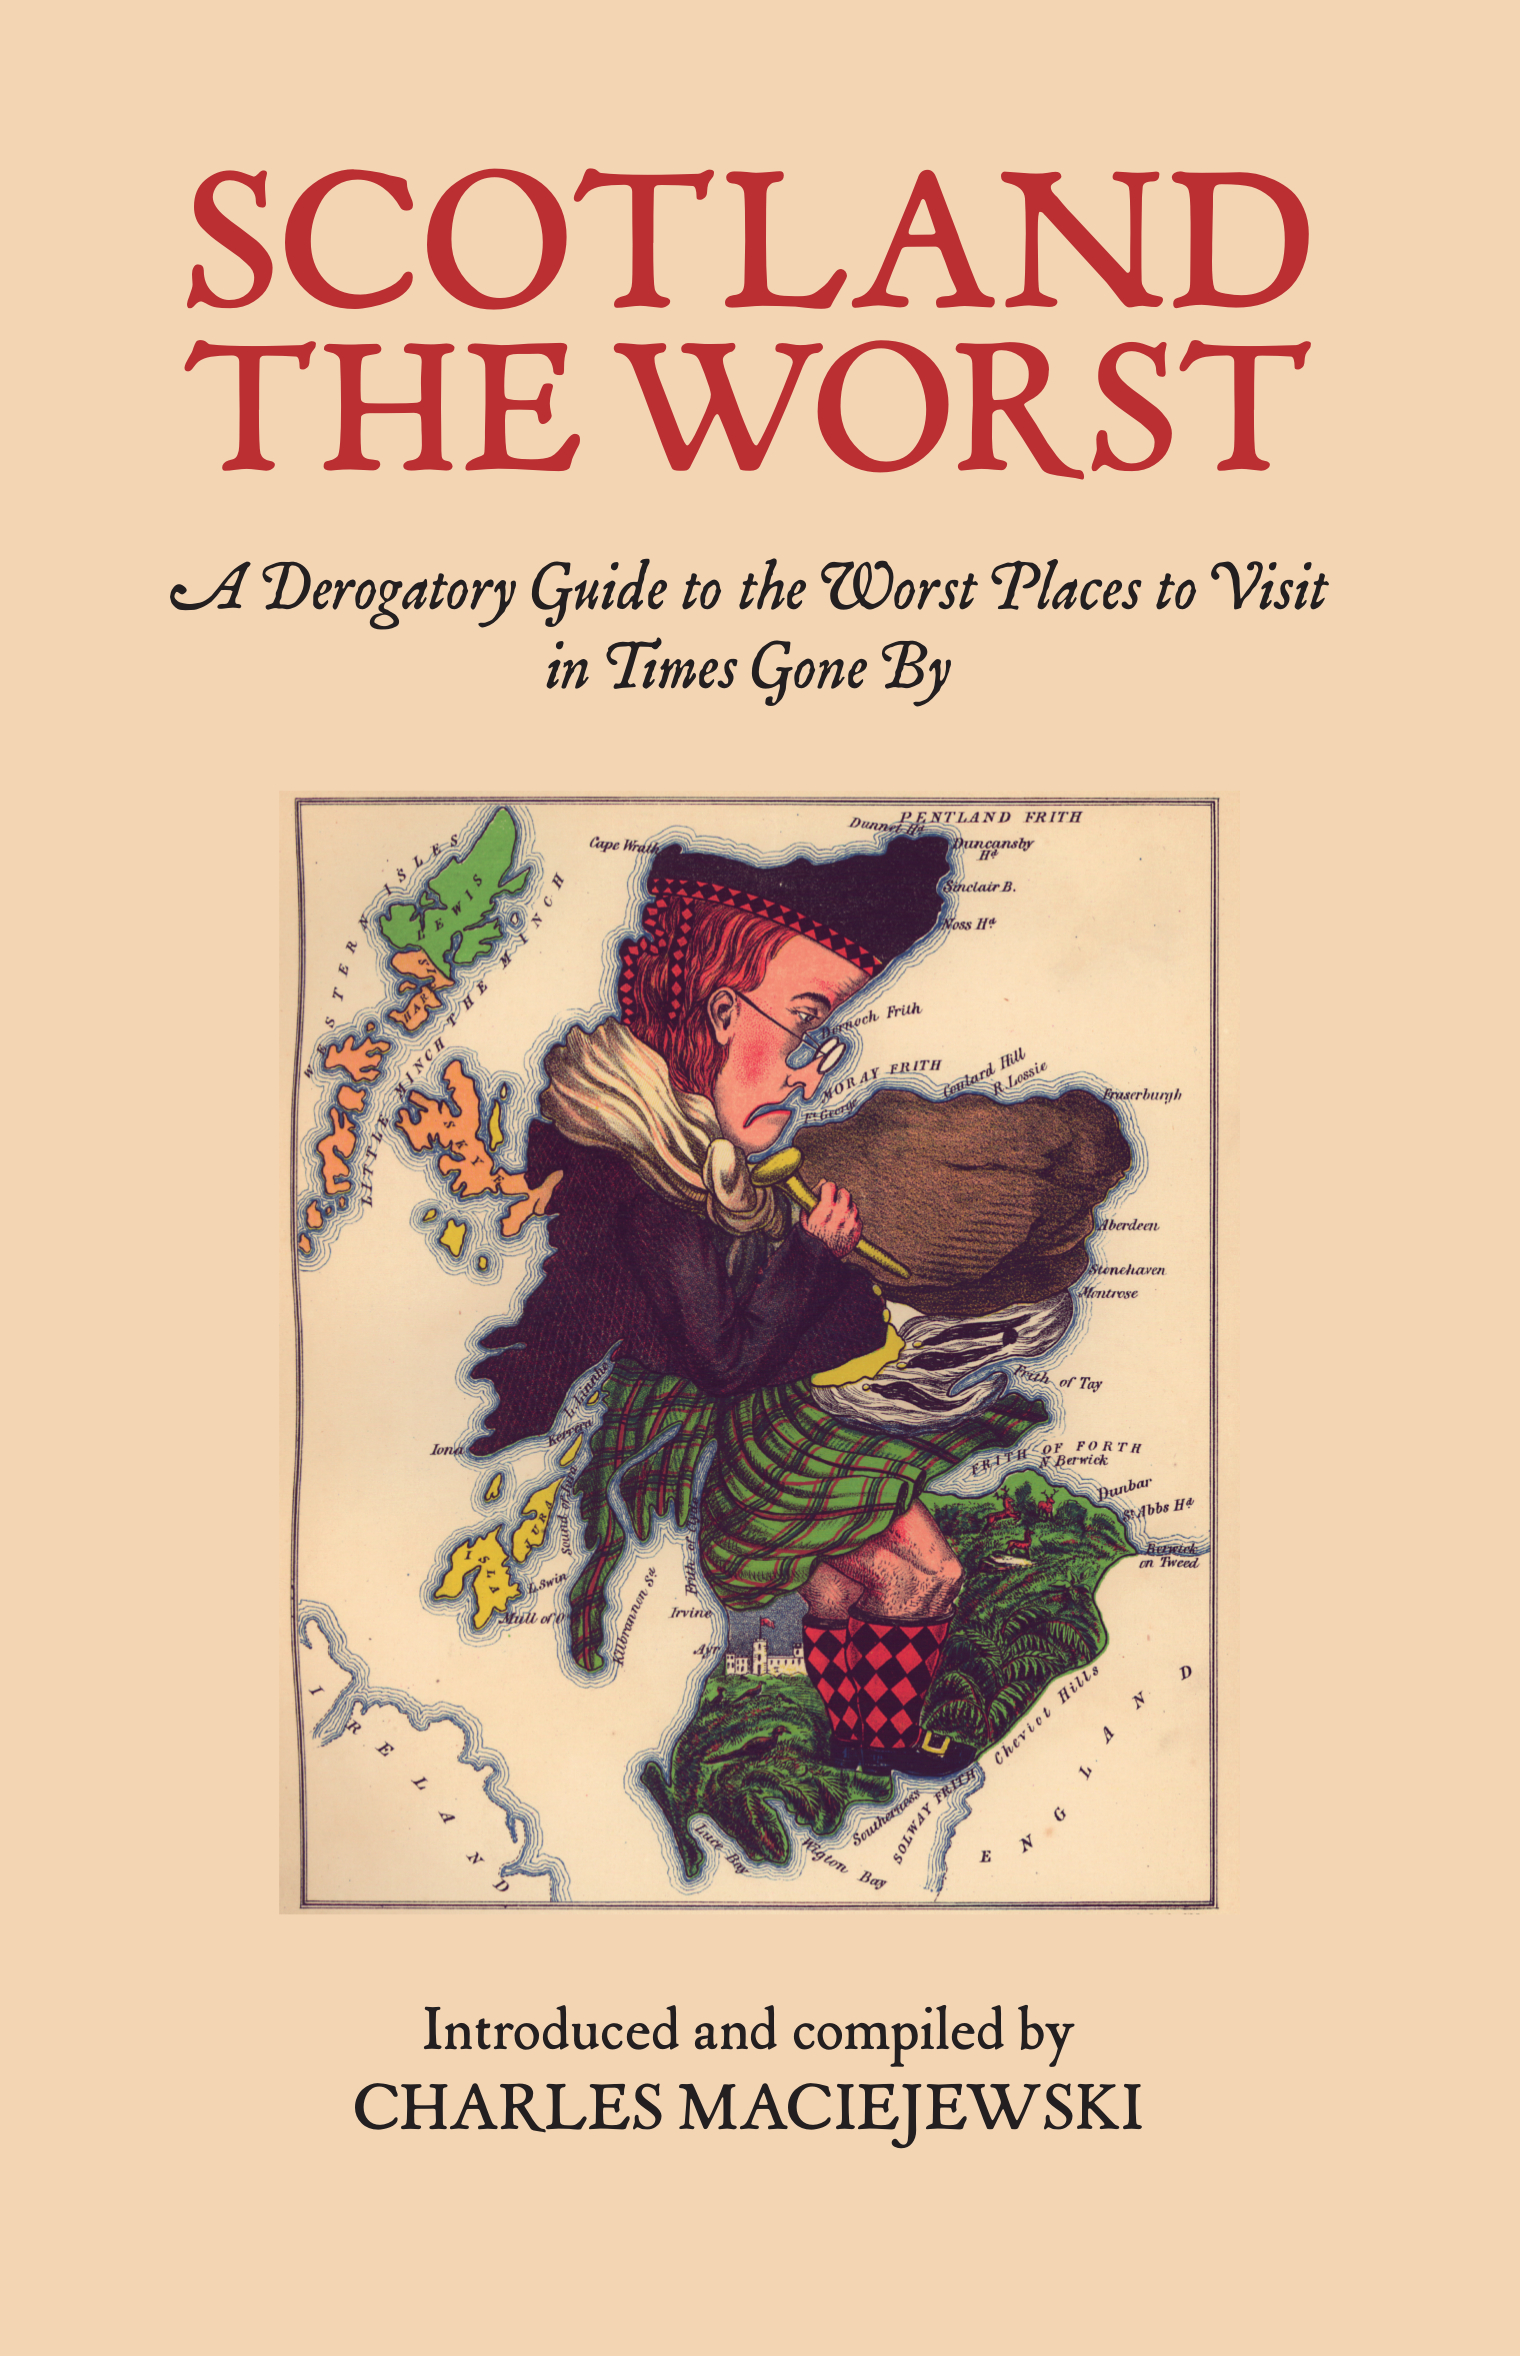 Scotland the Worst Charles Maciejewski 9781912147922 Luath Press.jpg